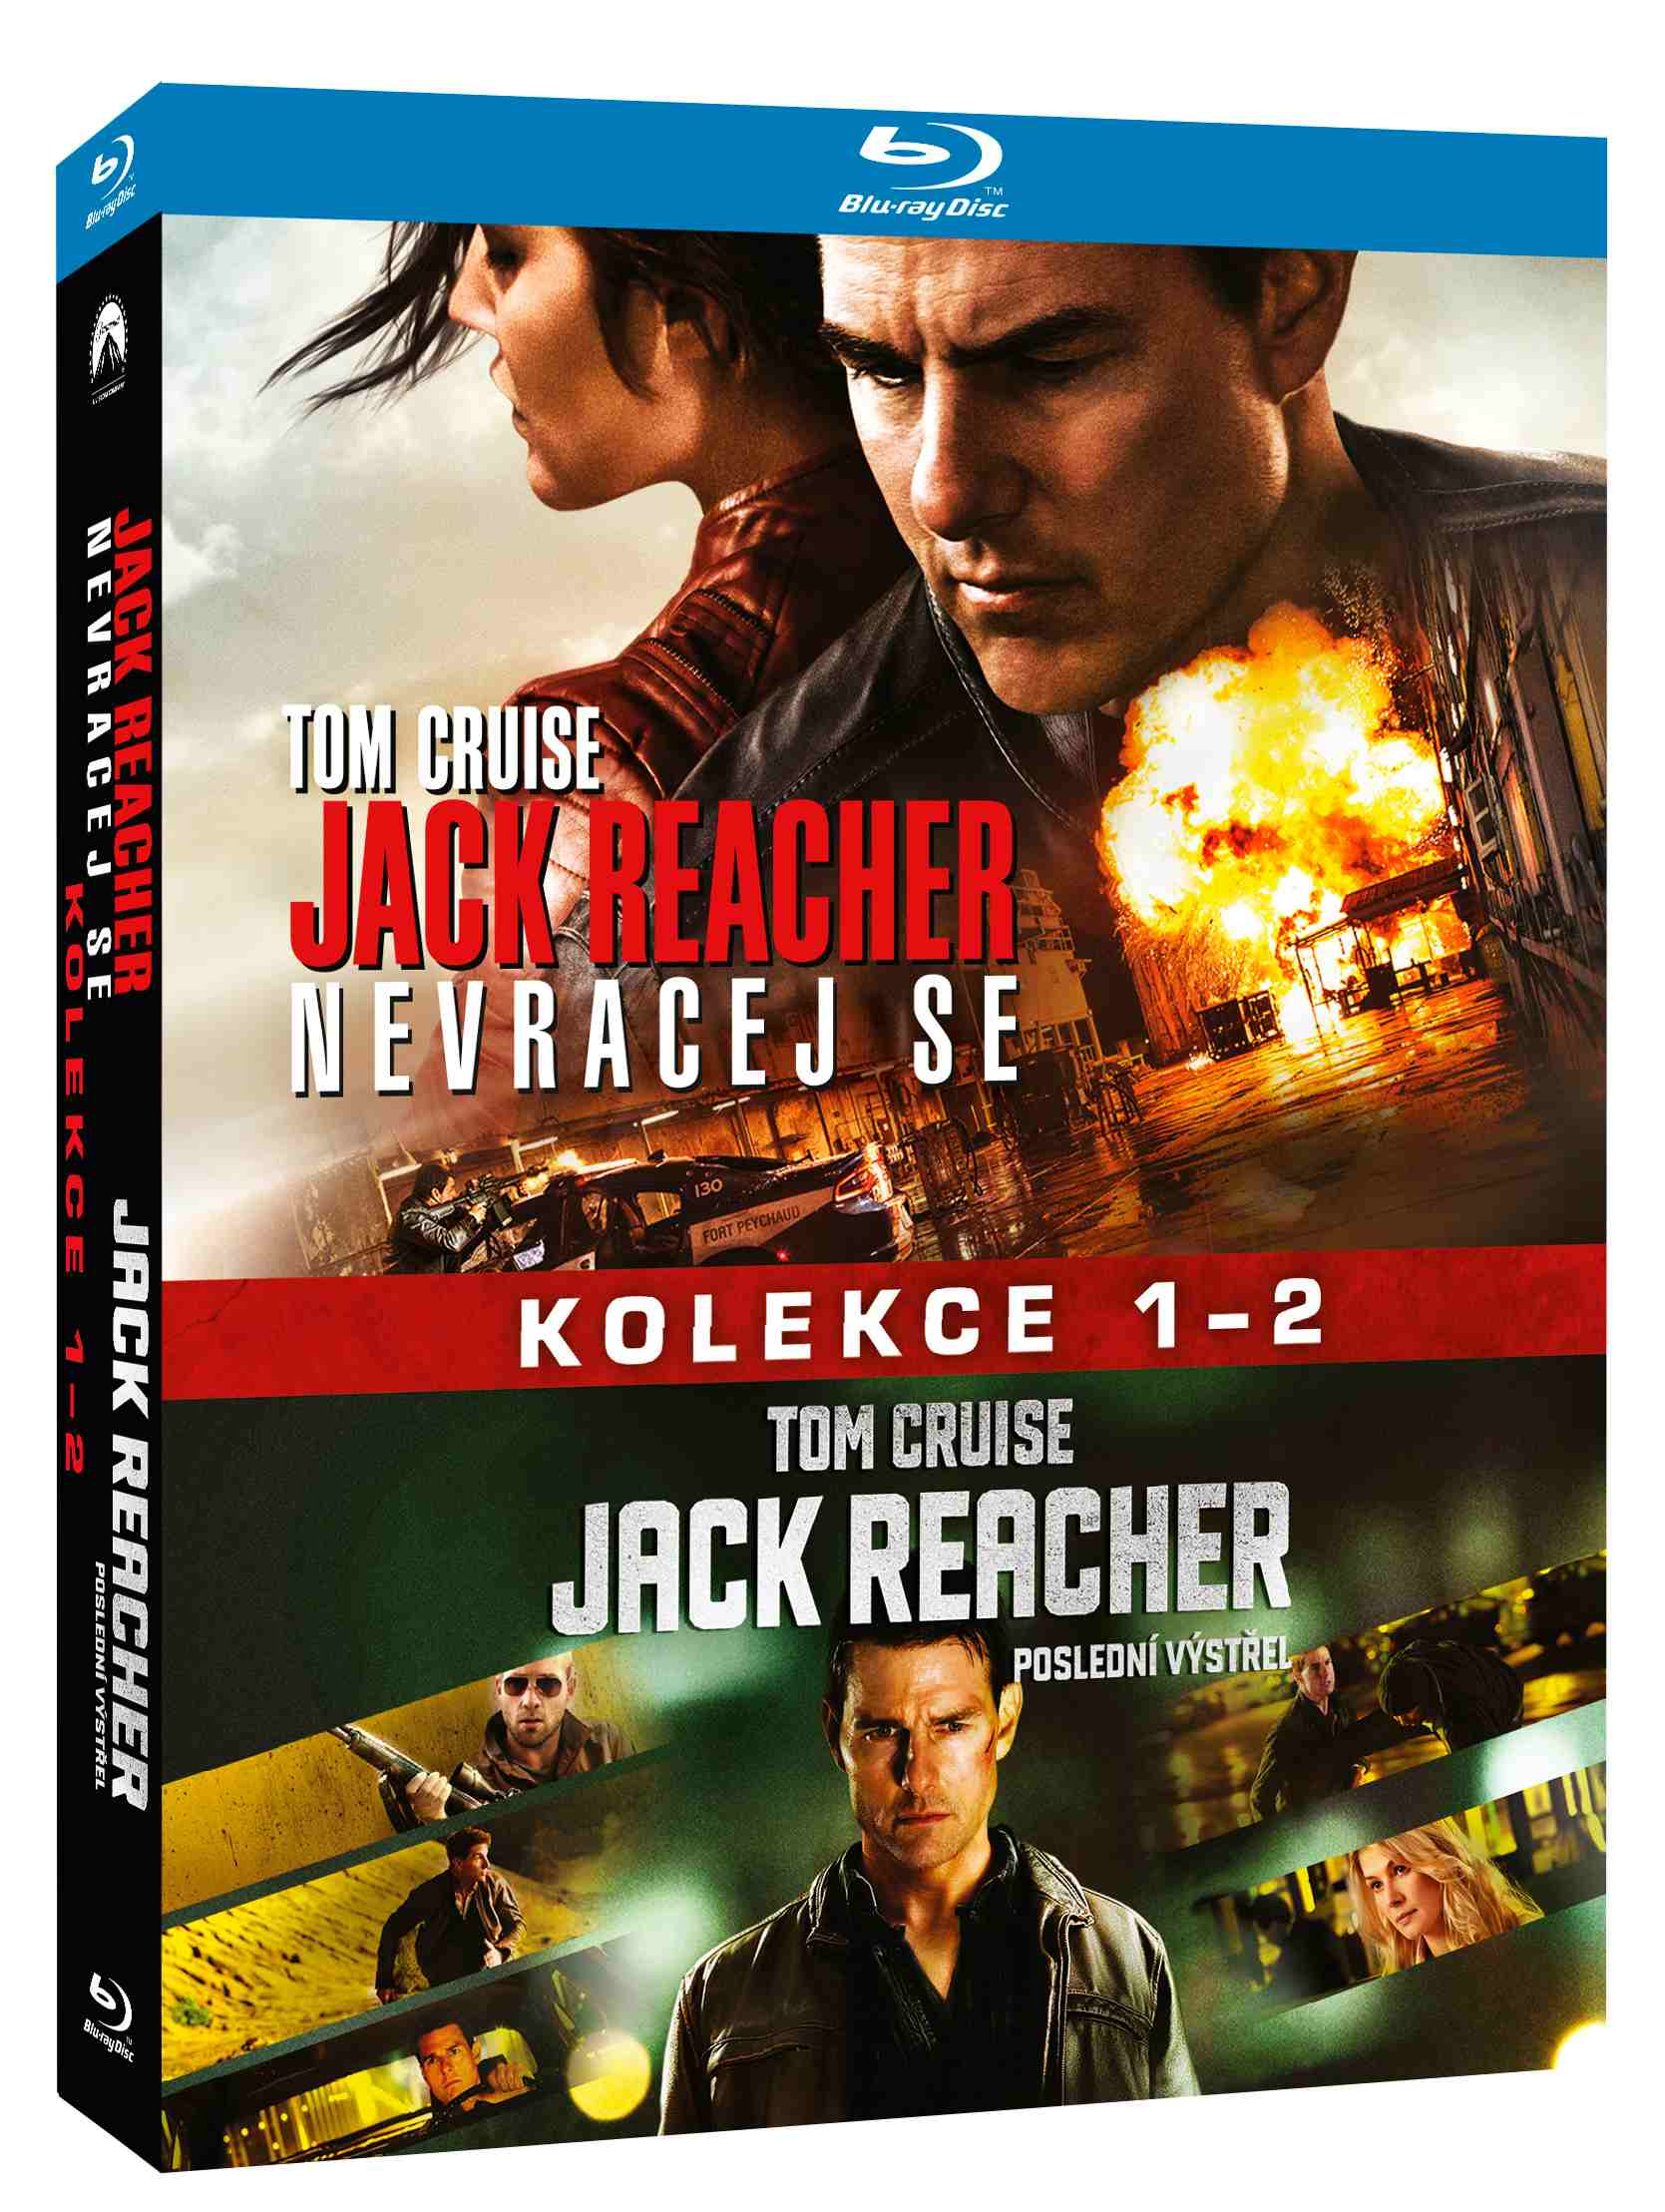 JACK REACHER 1+2 KOLEKCE (2 BD) - Blu-ray